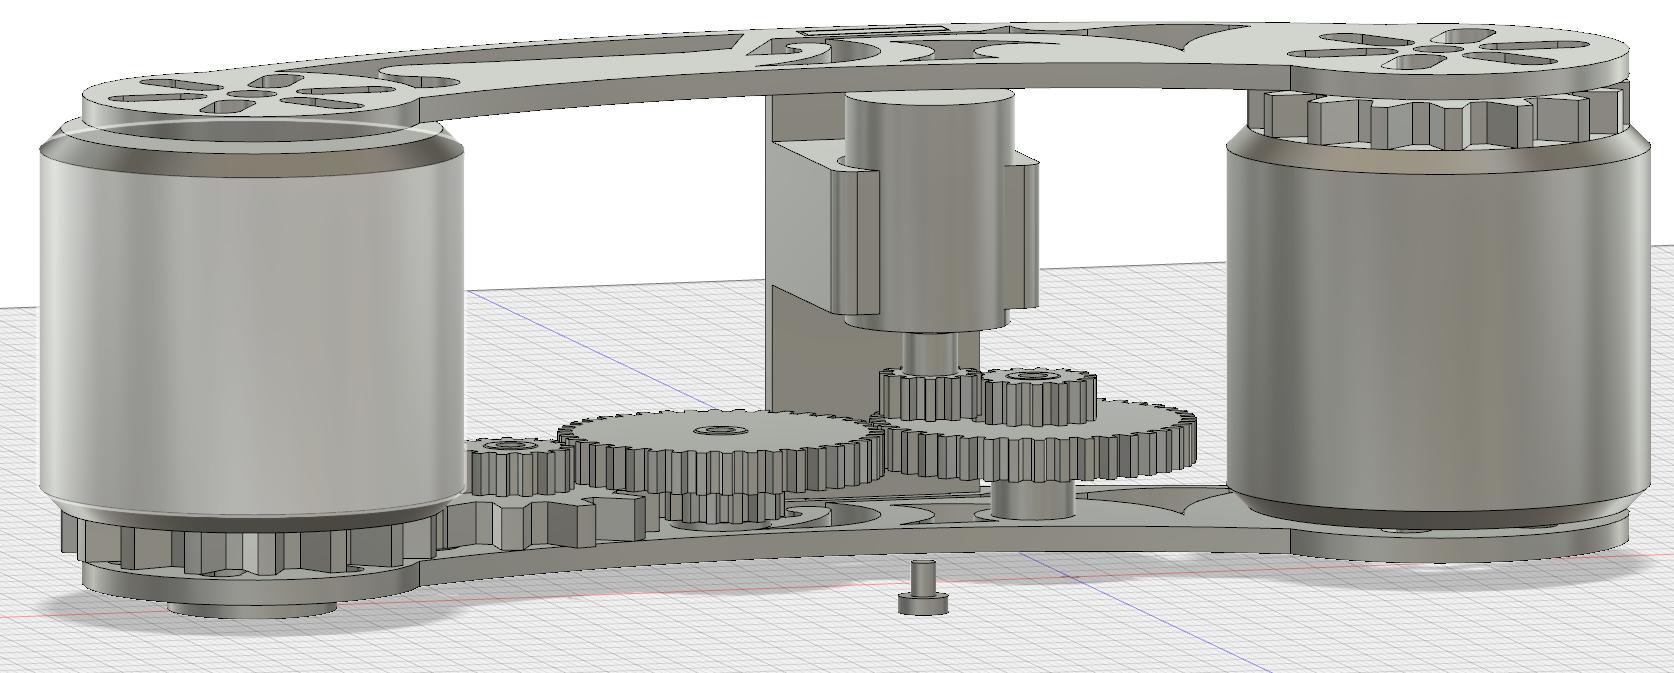 gear-setup001.png Download free STL file AUG 2018 UFO Project, Drift Motorcycle • 3D printer template, Alien3d